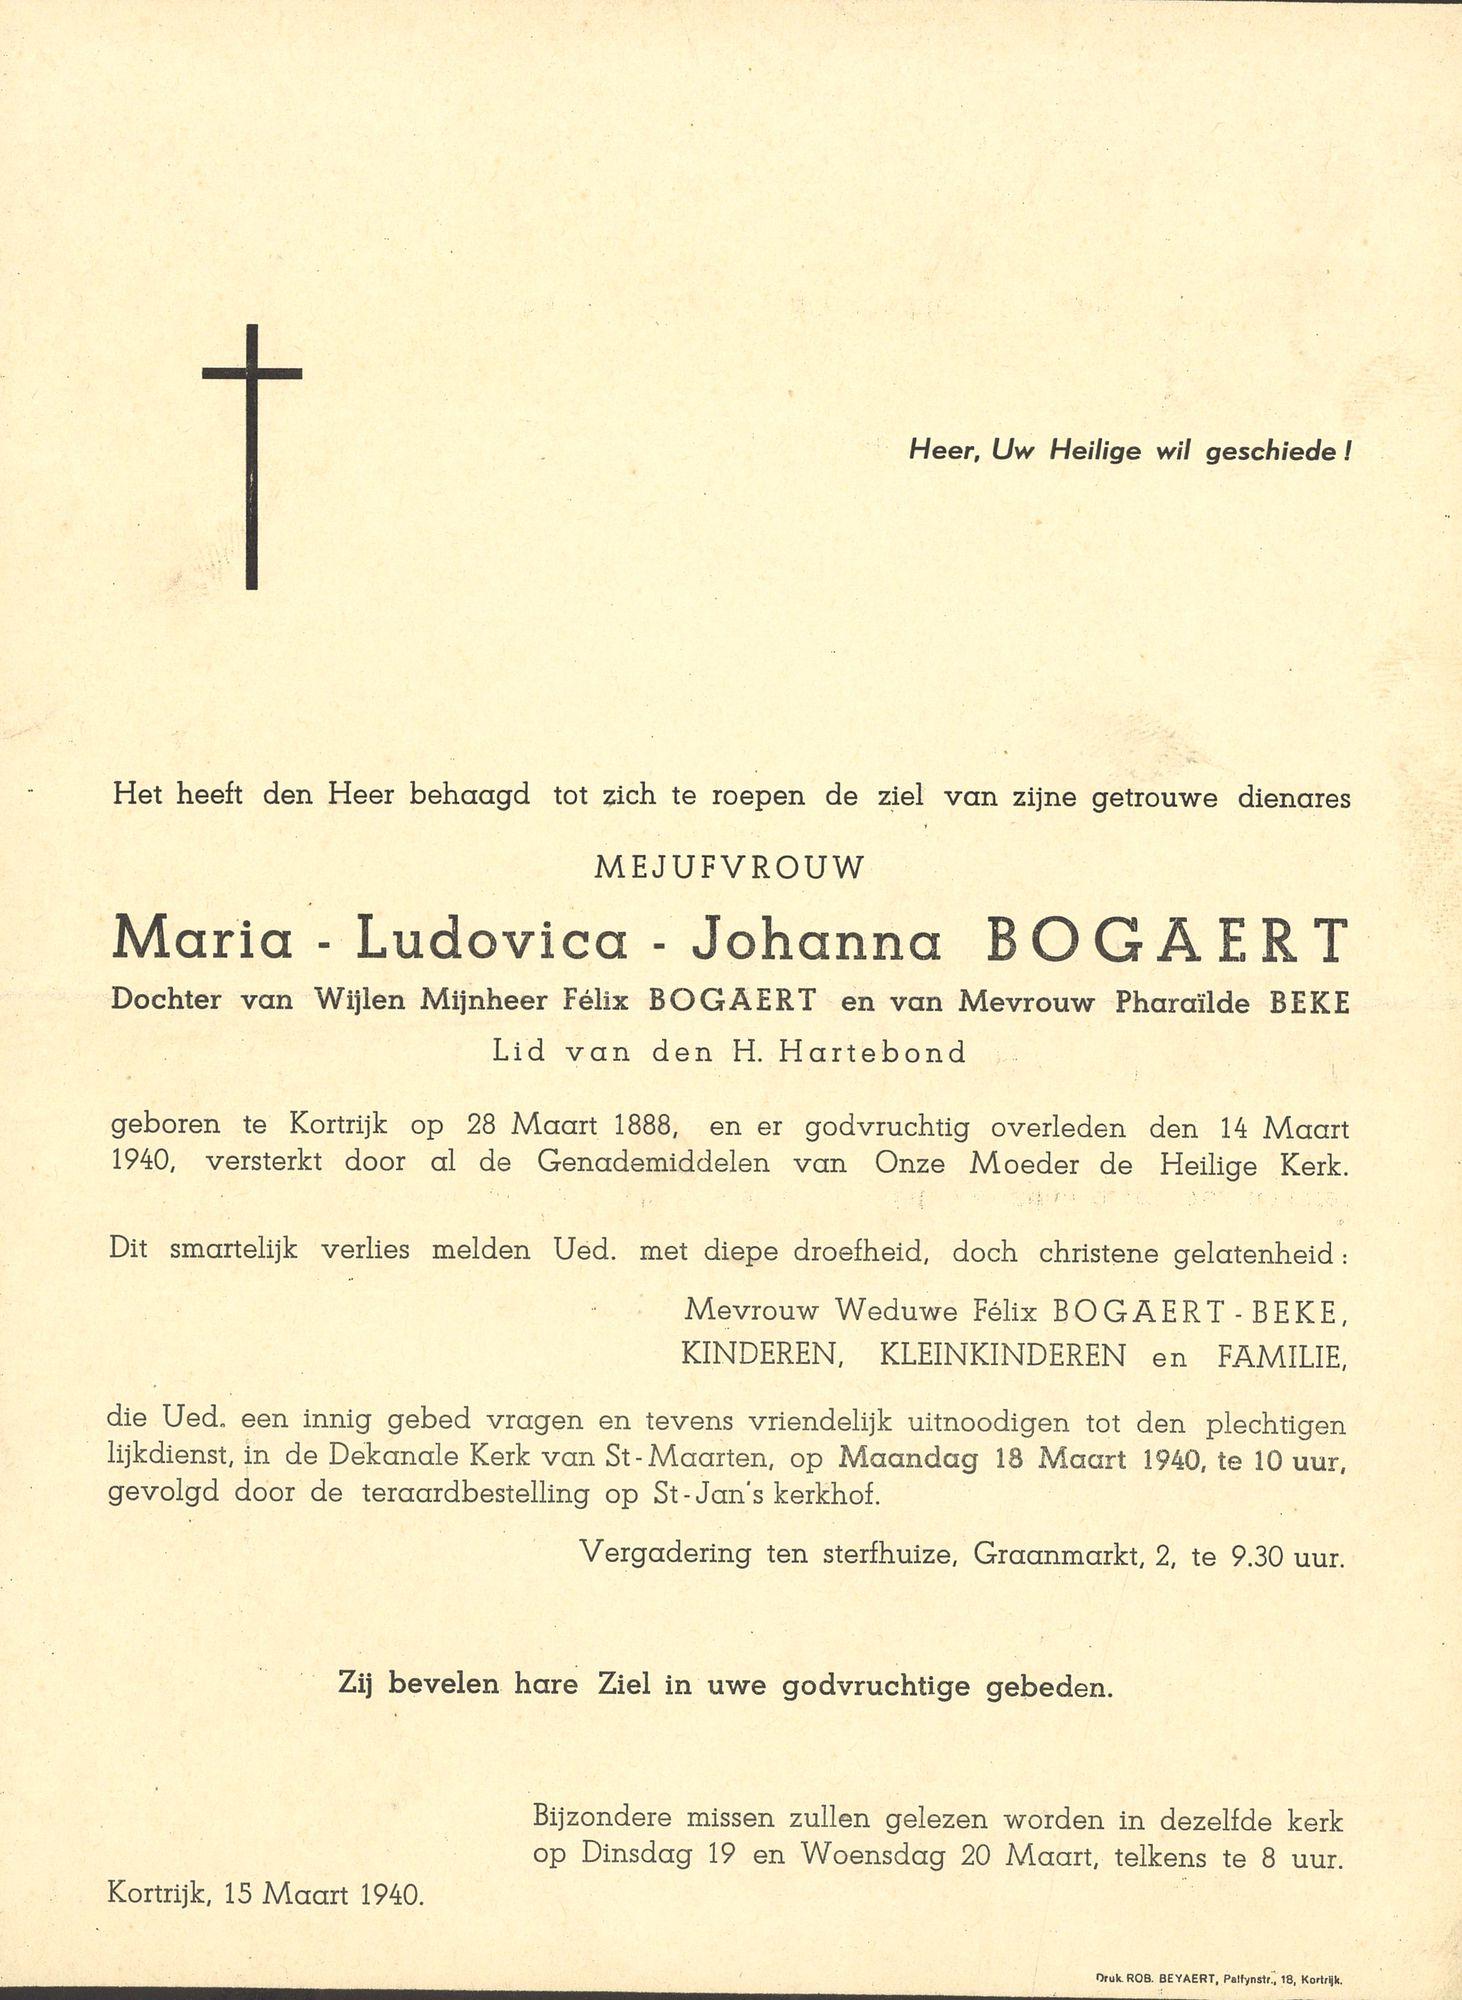 Maria-Ludovica-Johanna Bogaert